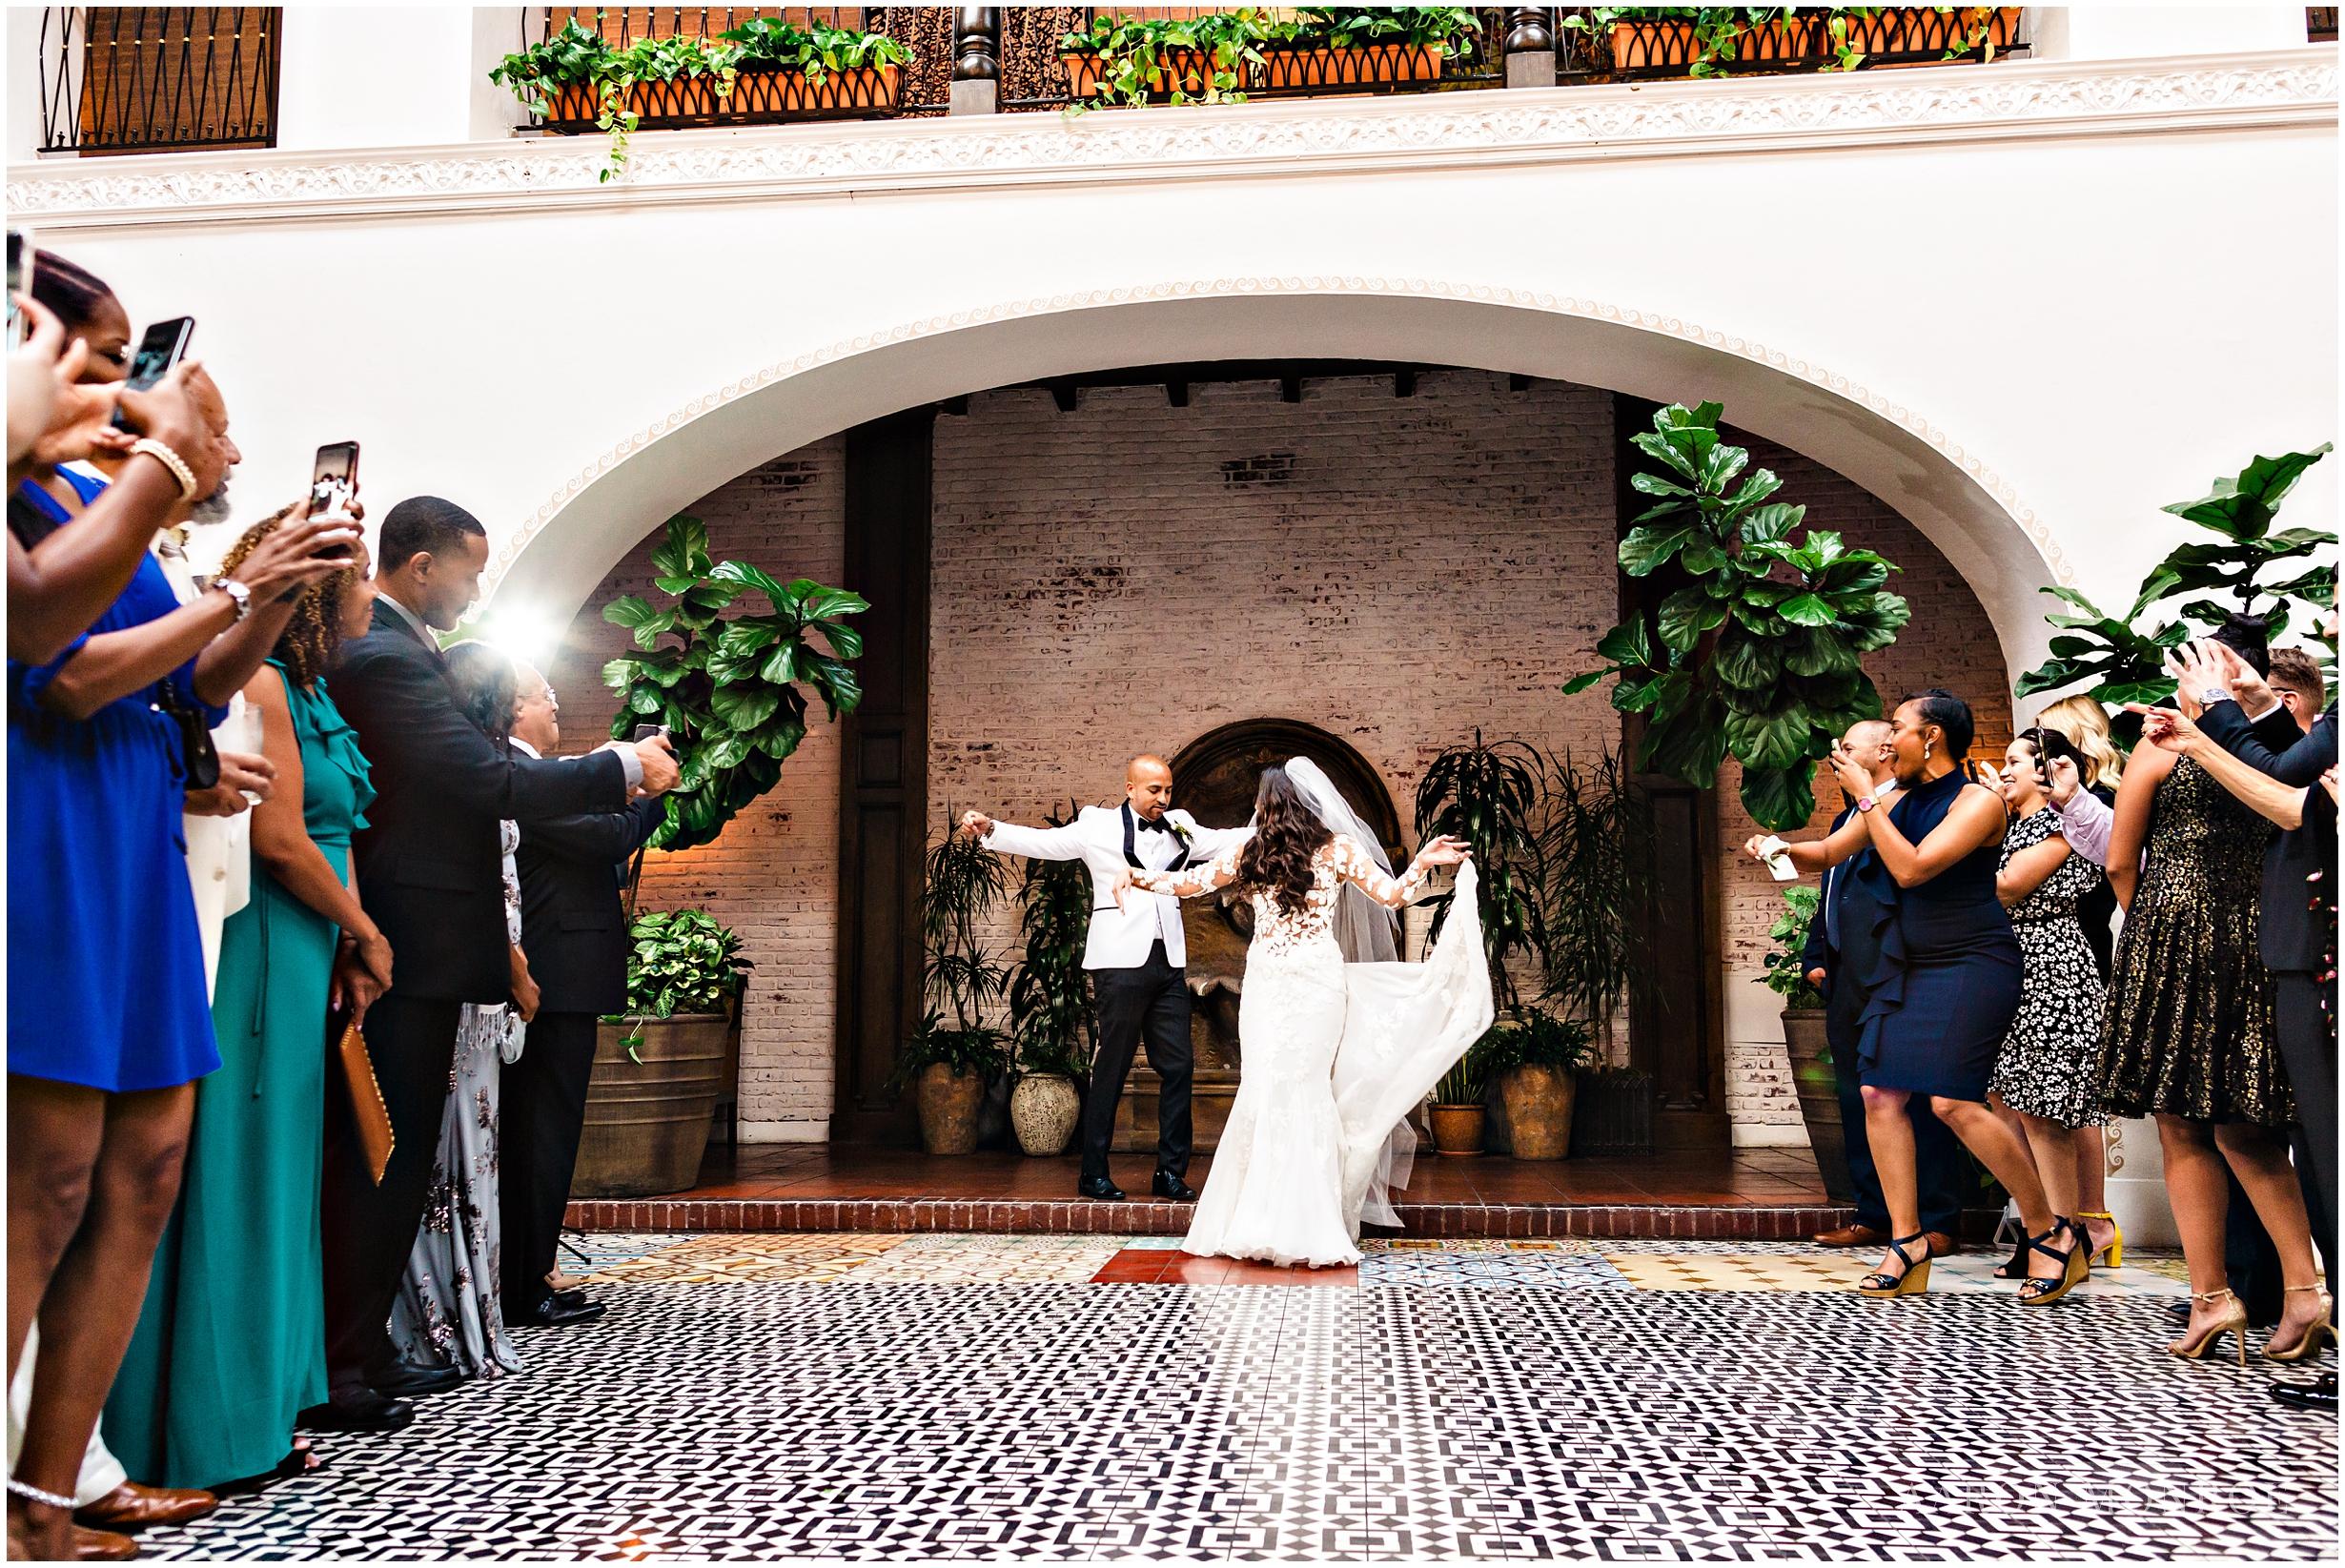 Ebell_Long_Beach_Wedding_Photography_0864.jpg